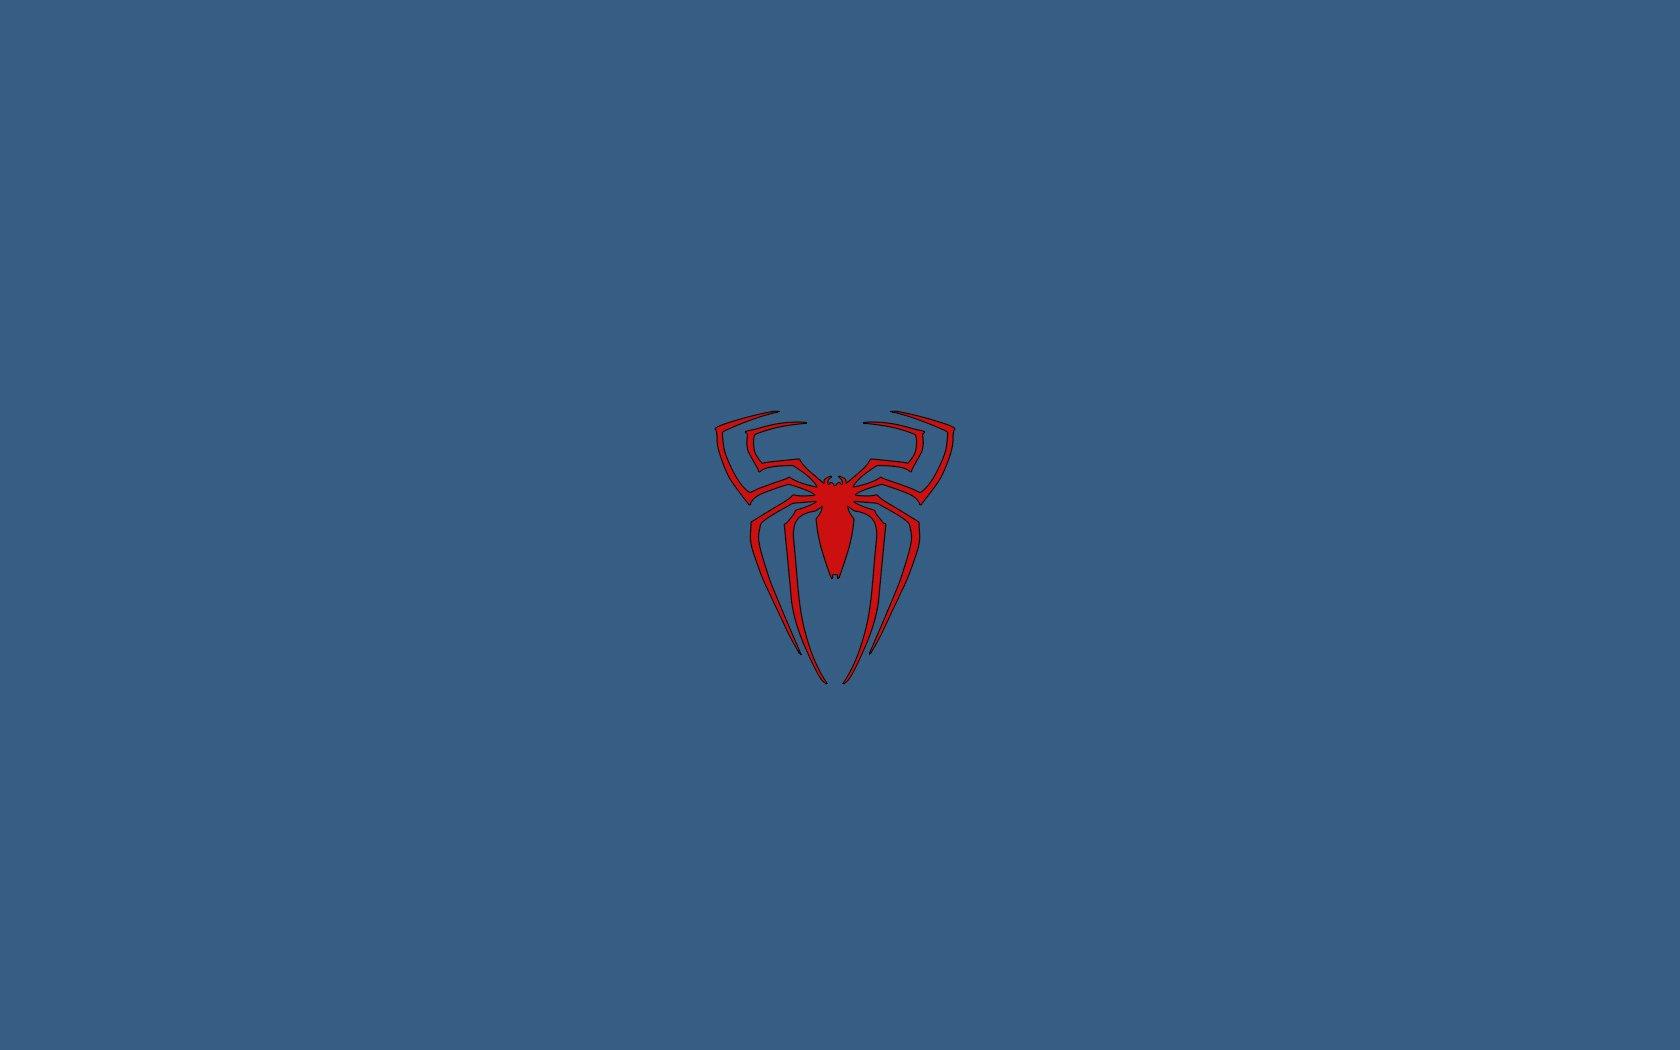 Minimalistic Spider Man Blue Background Logo Wallpaper